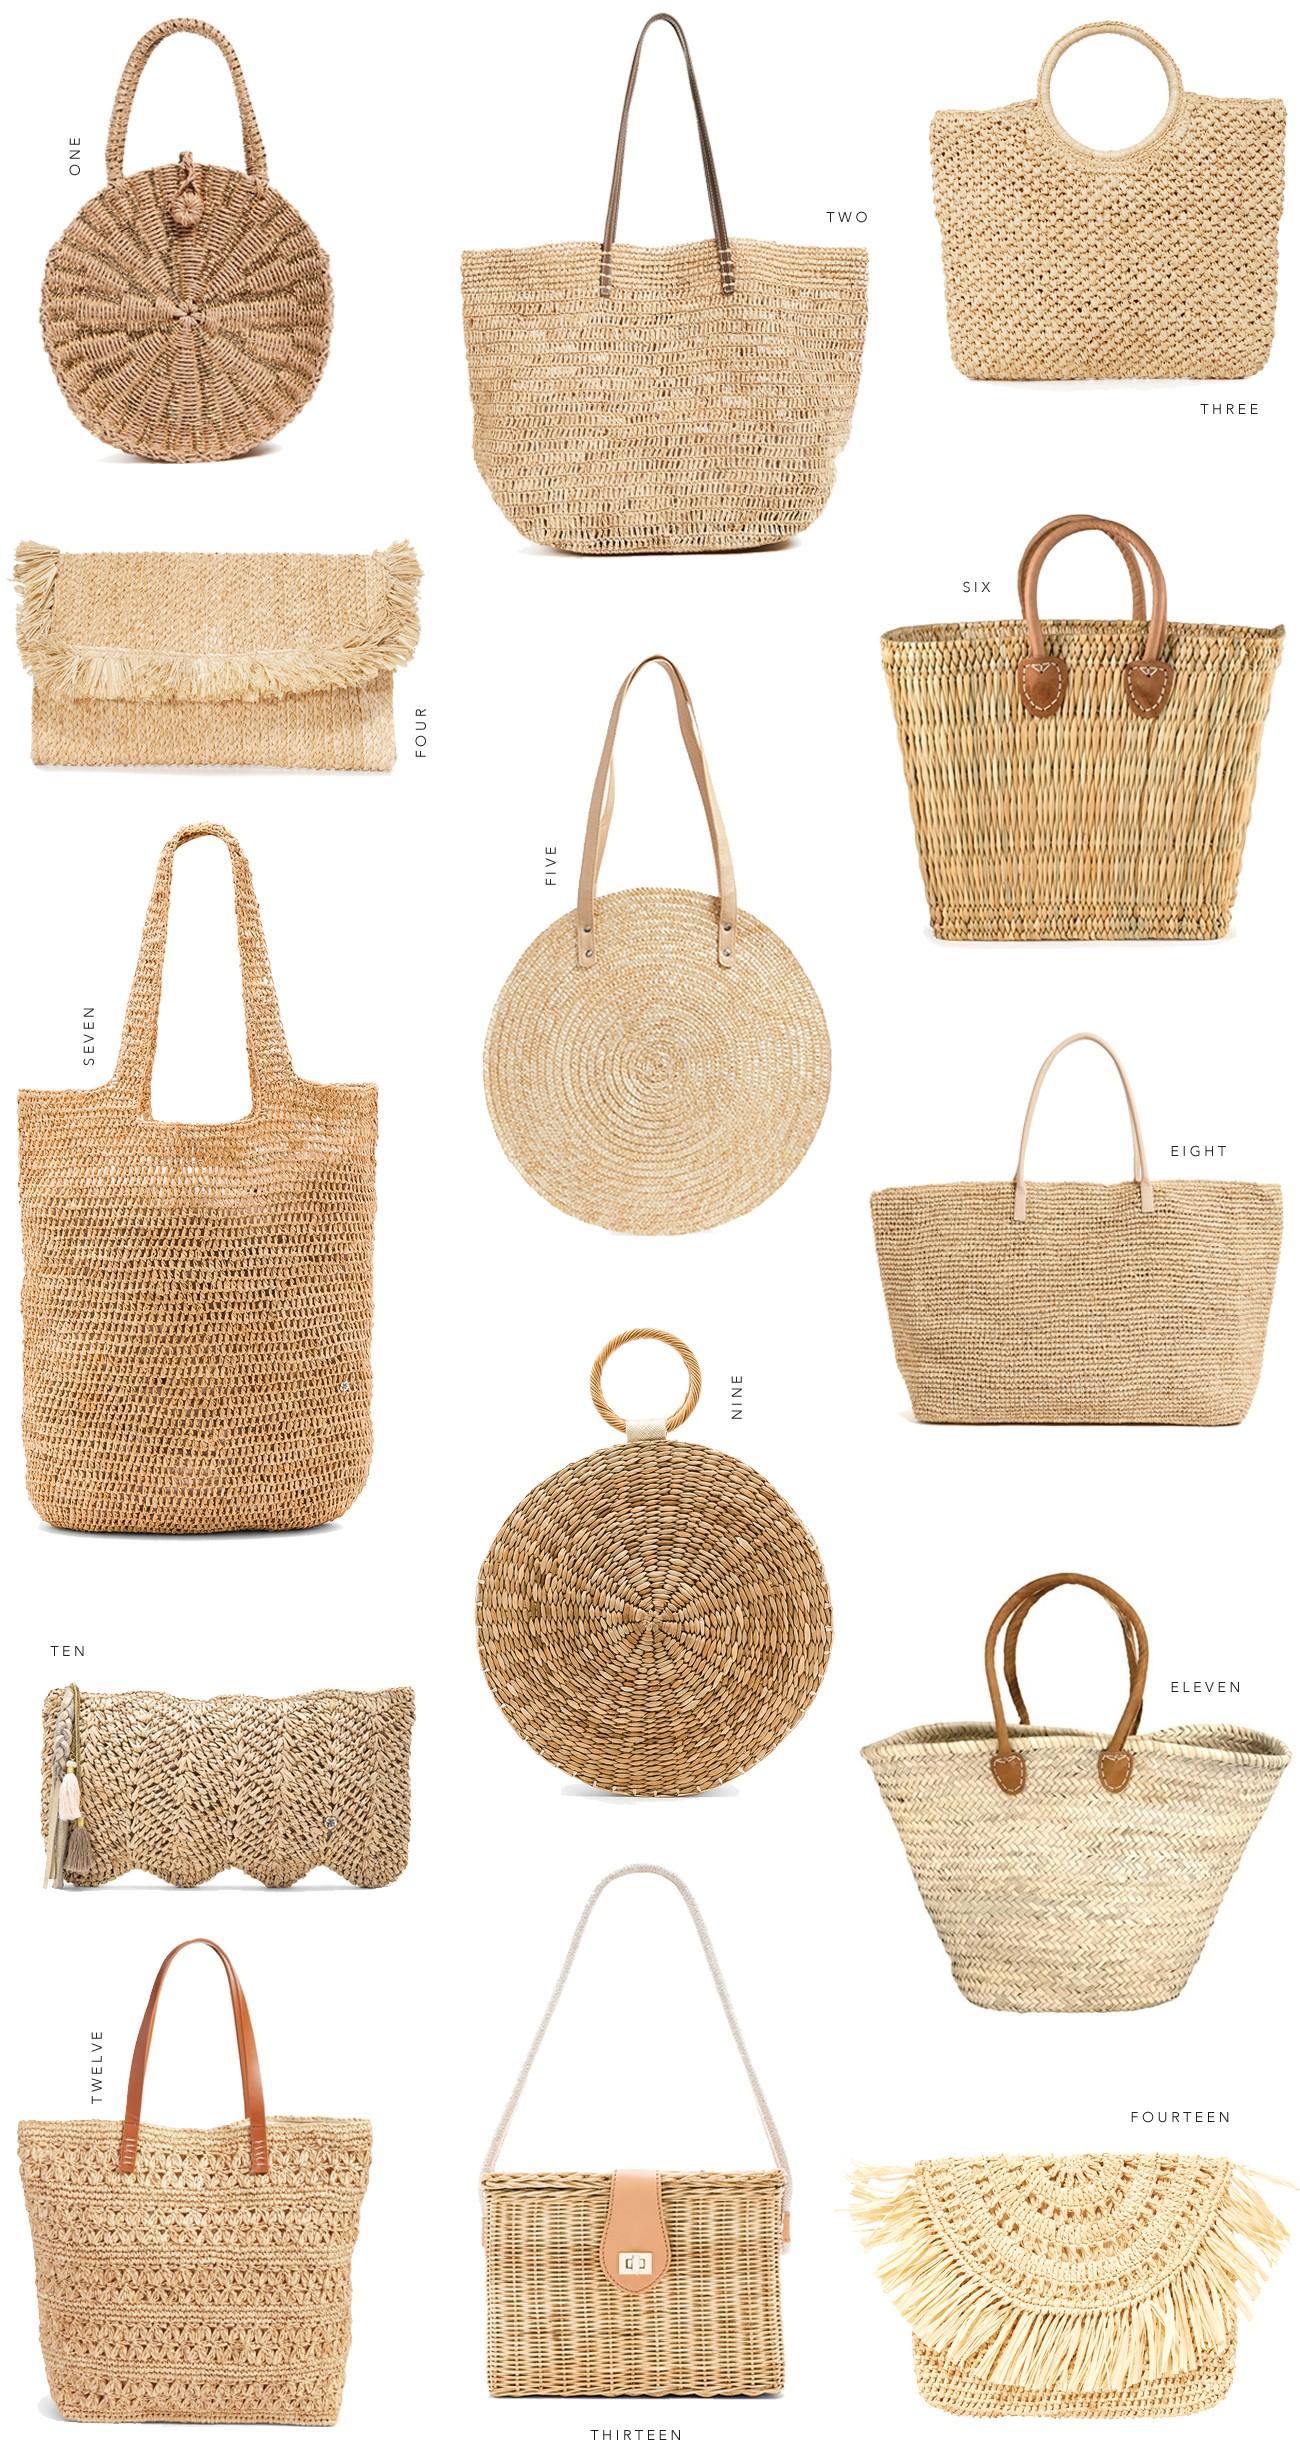 Image result for summer woven bag